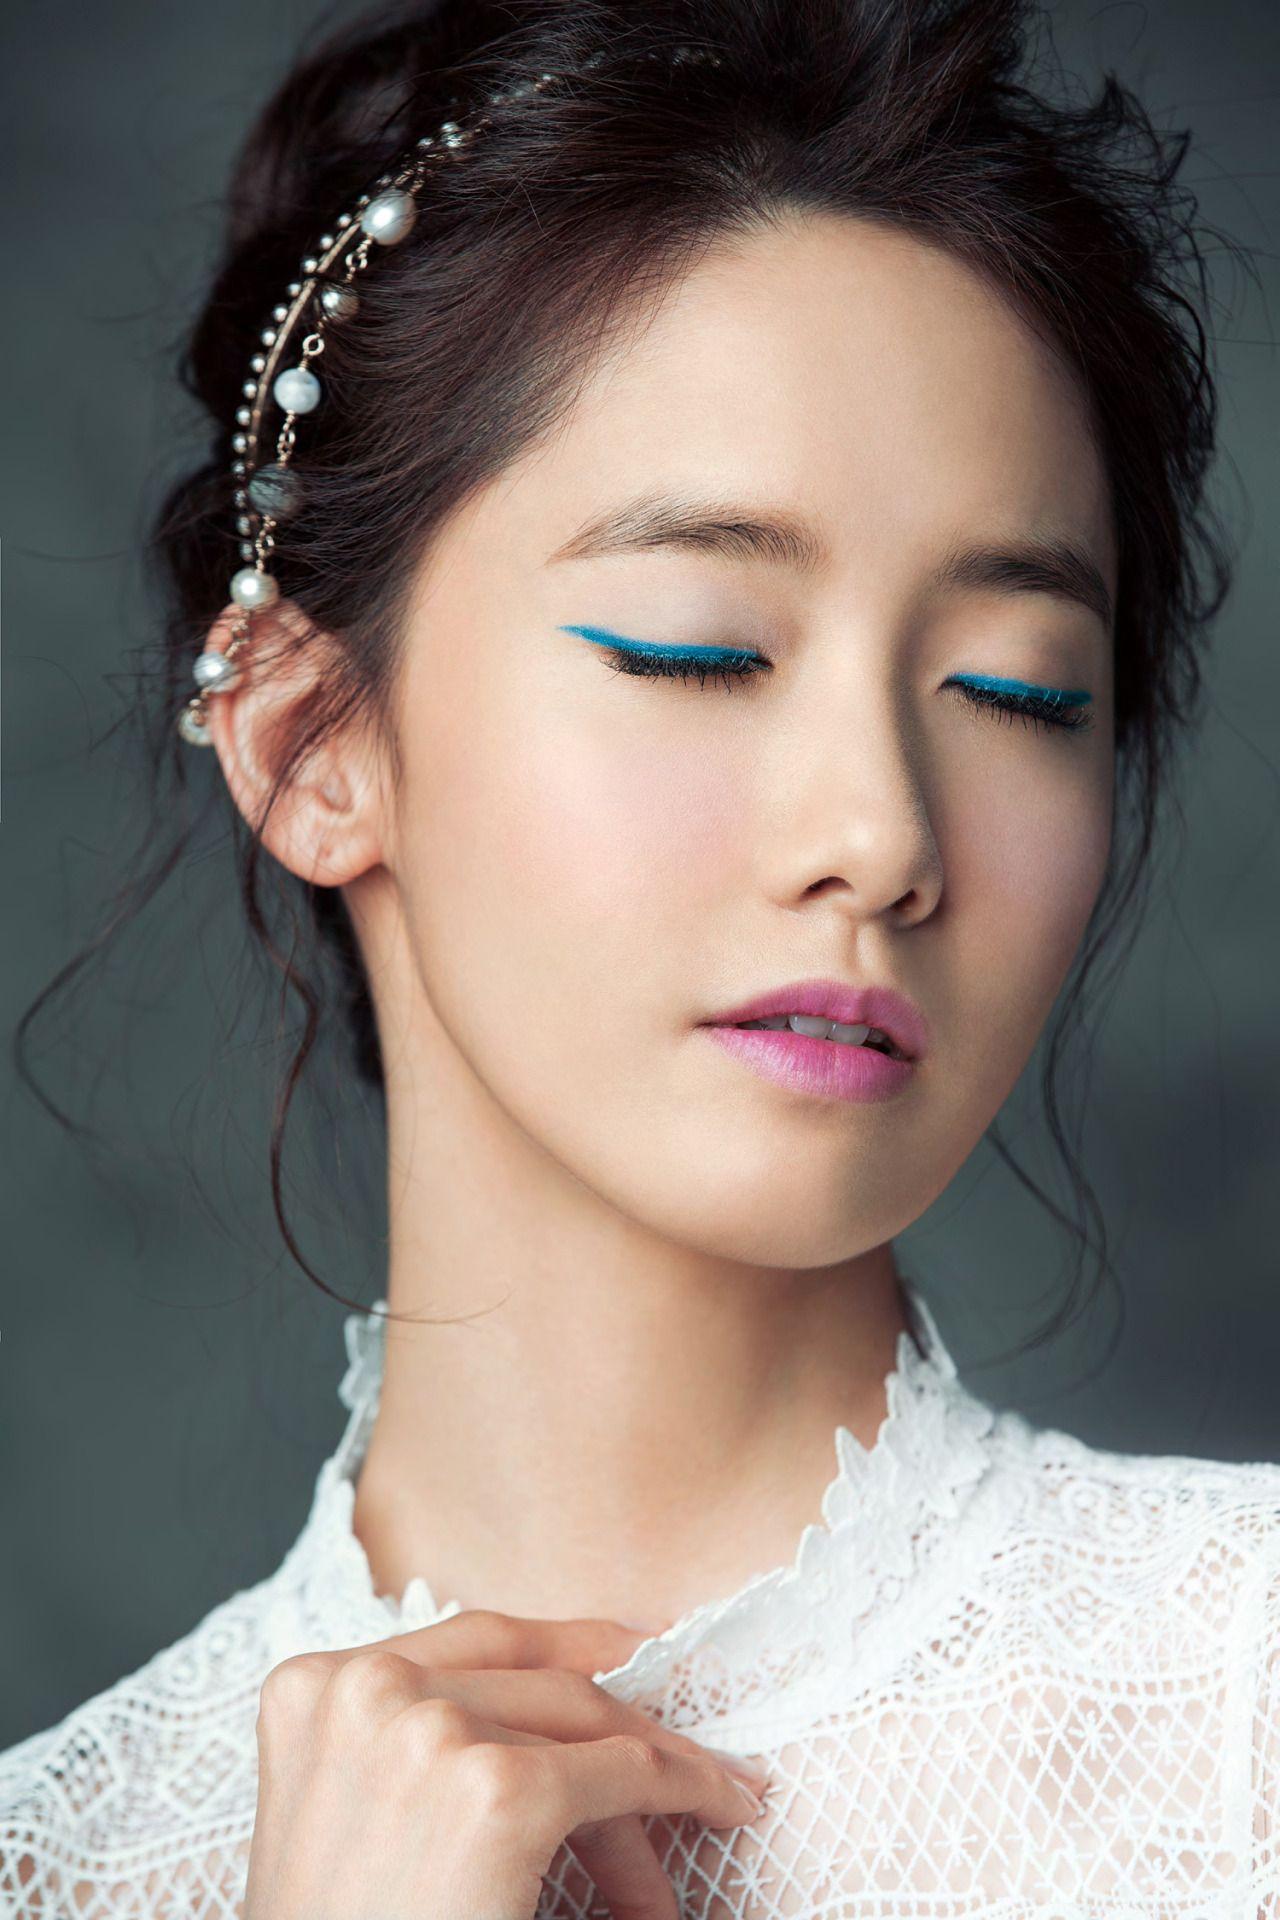 Korean Magazine Lovers Snsd Yoona Elle Magazine April Issue 15 Yoona Girls Generation Snsd